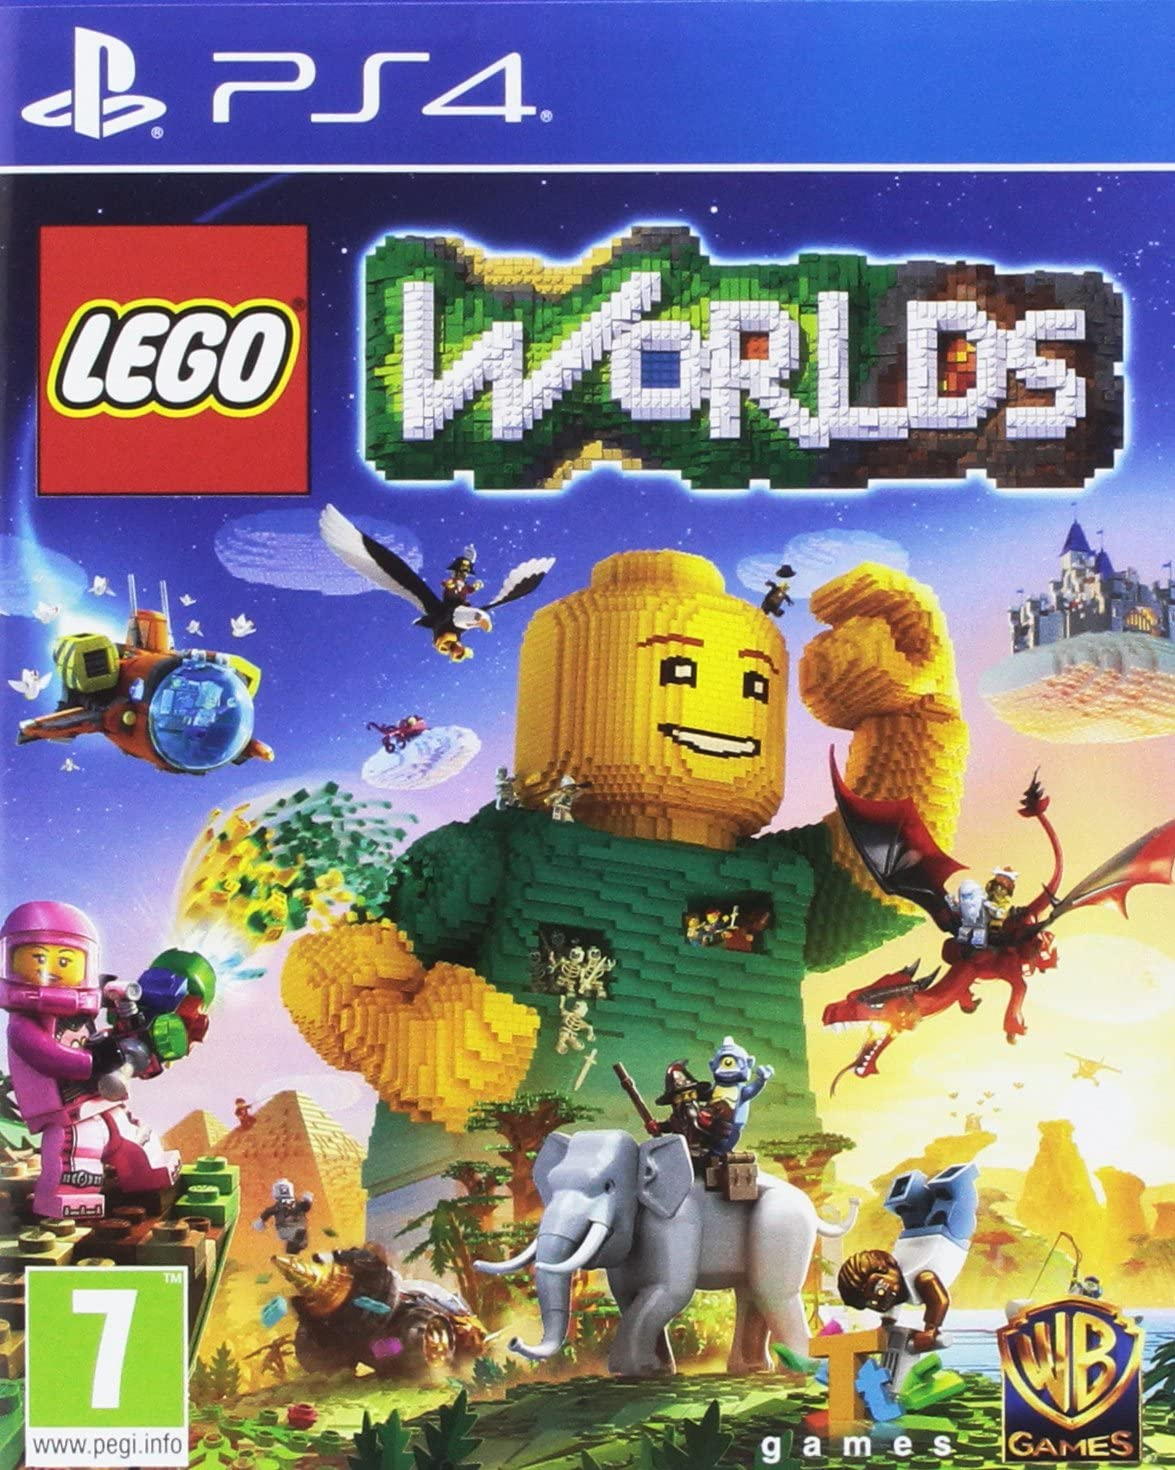 LEGO WORLDS PS4 - Warner 1.12.74.01.028